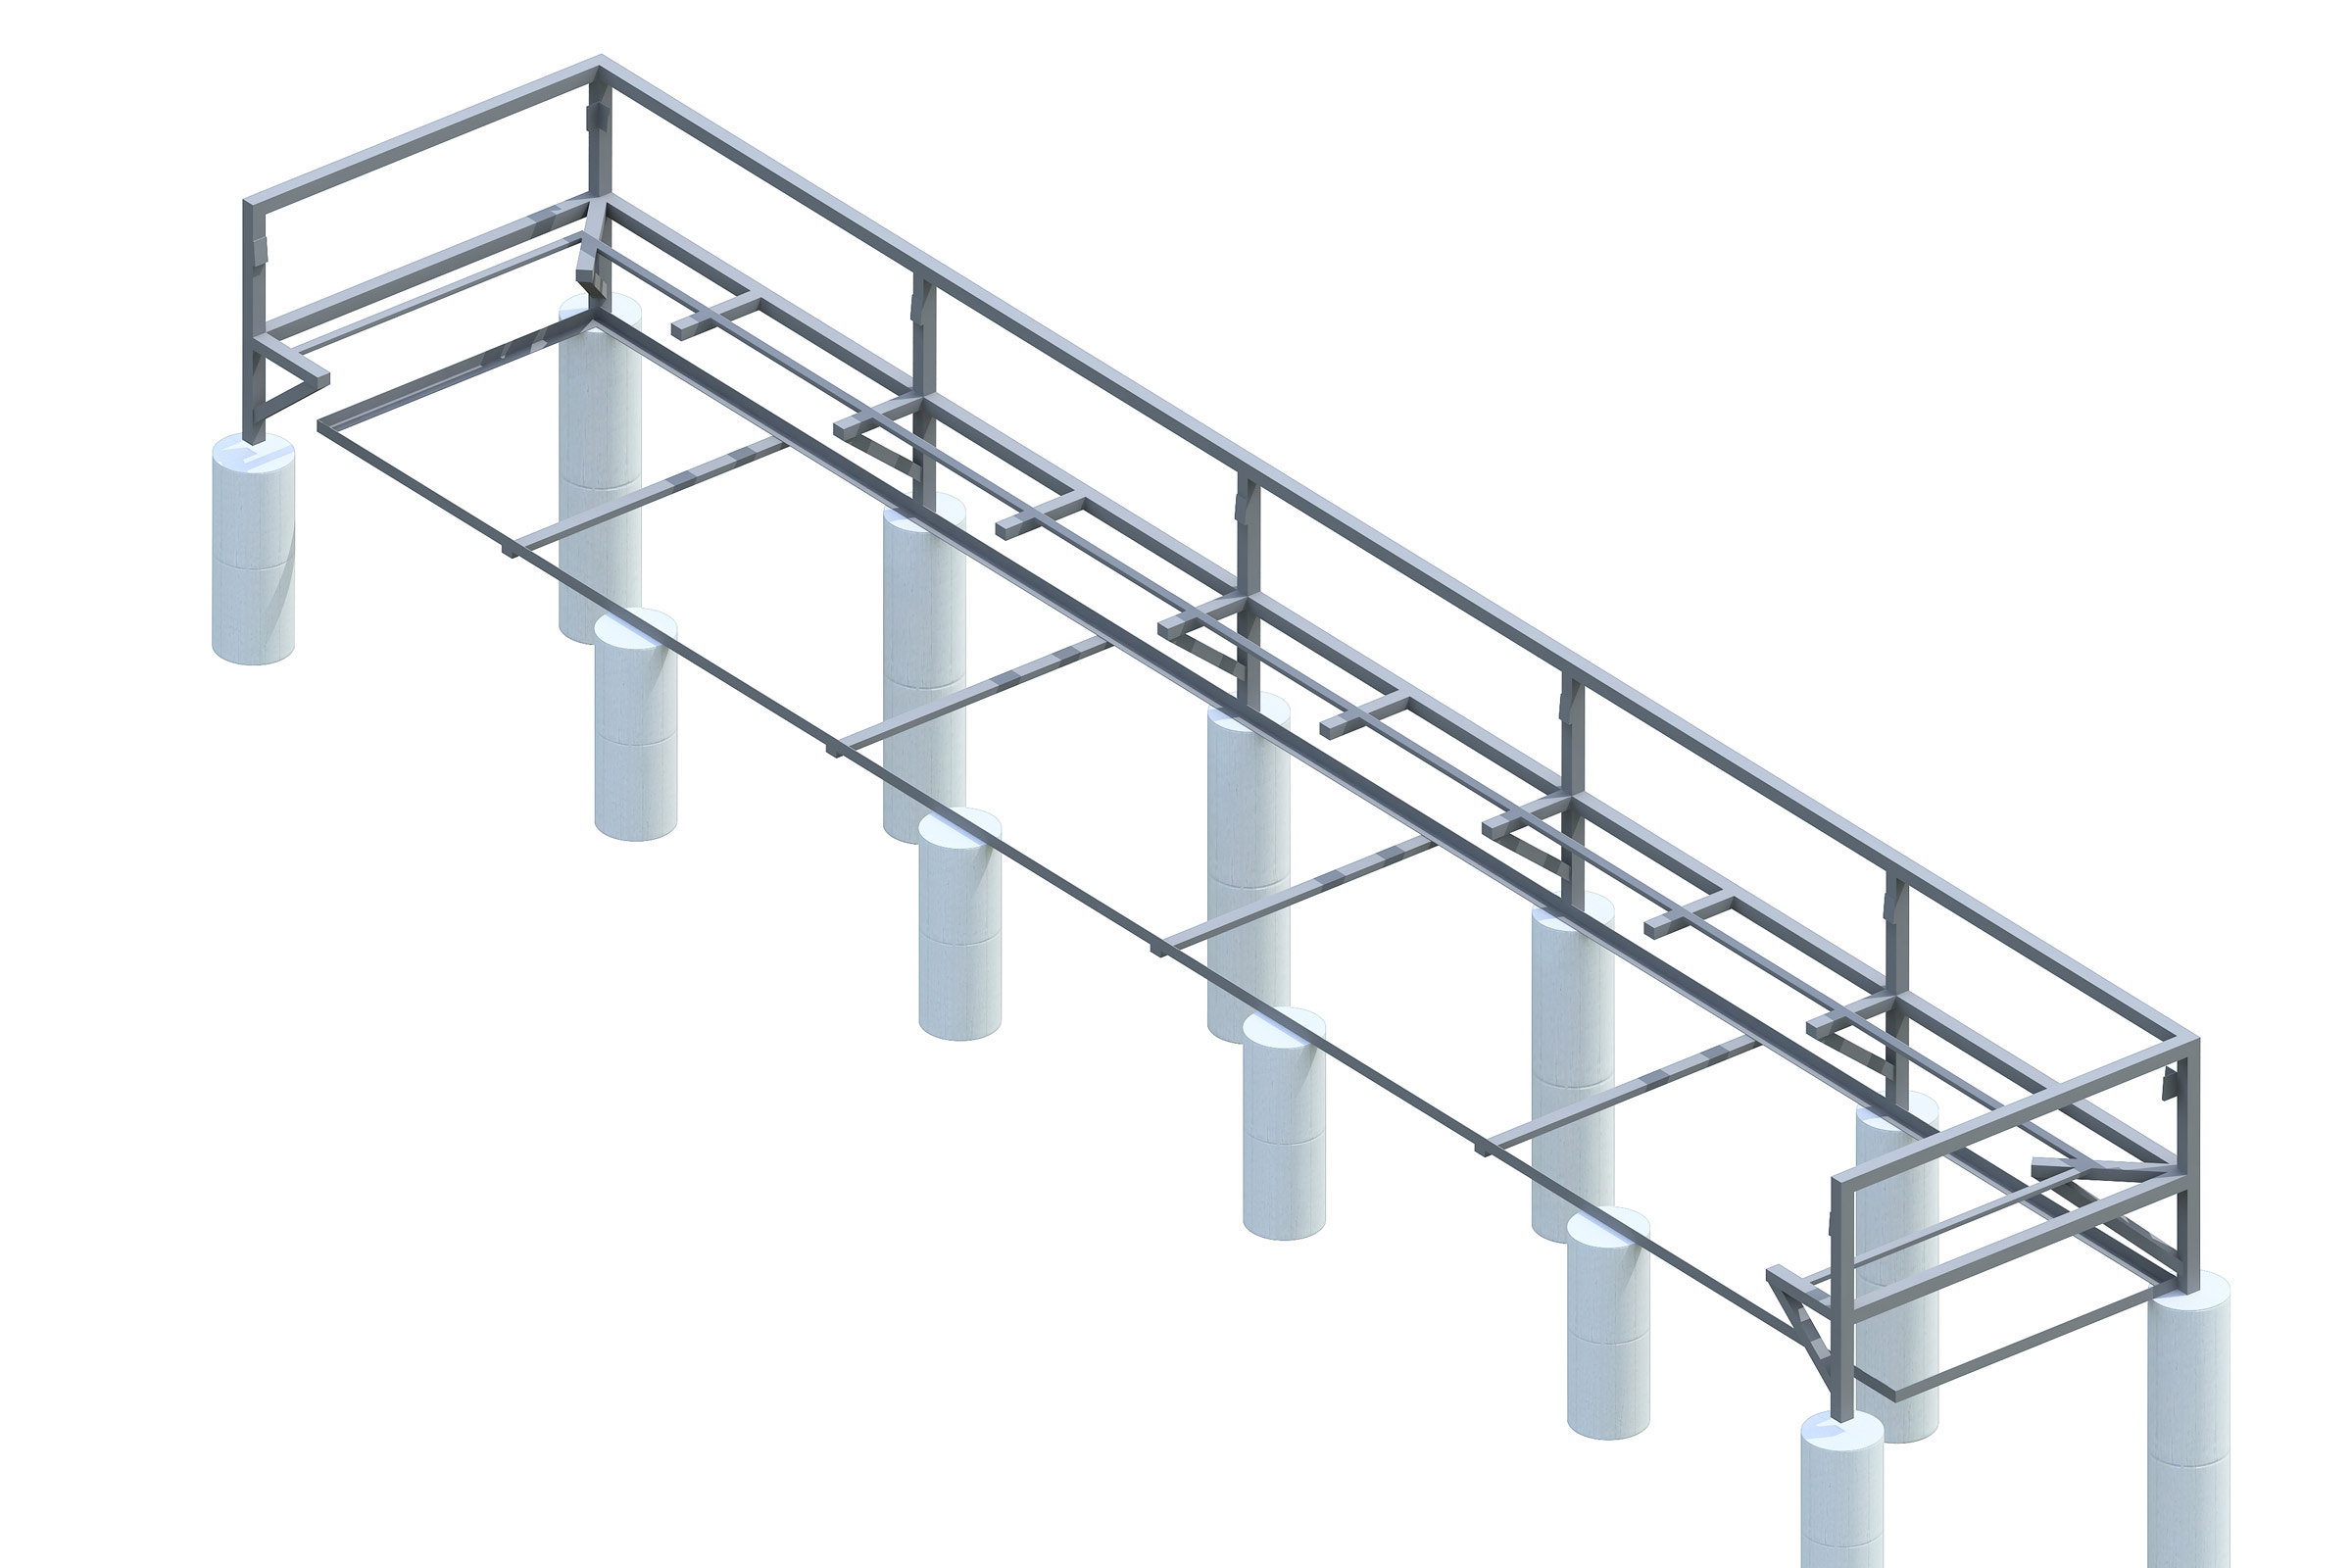 spinka-kiosek-terasaizometrie-konstrukce